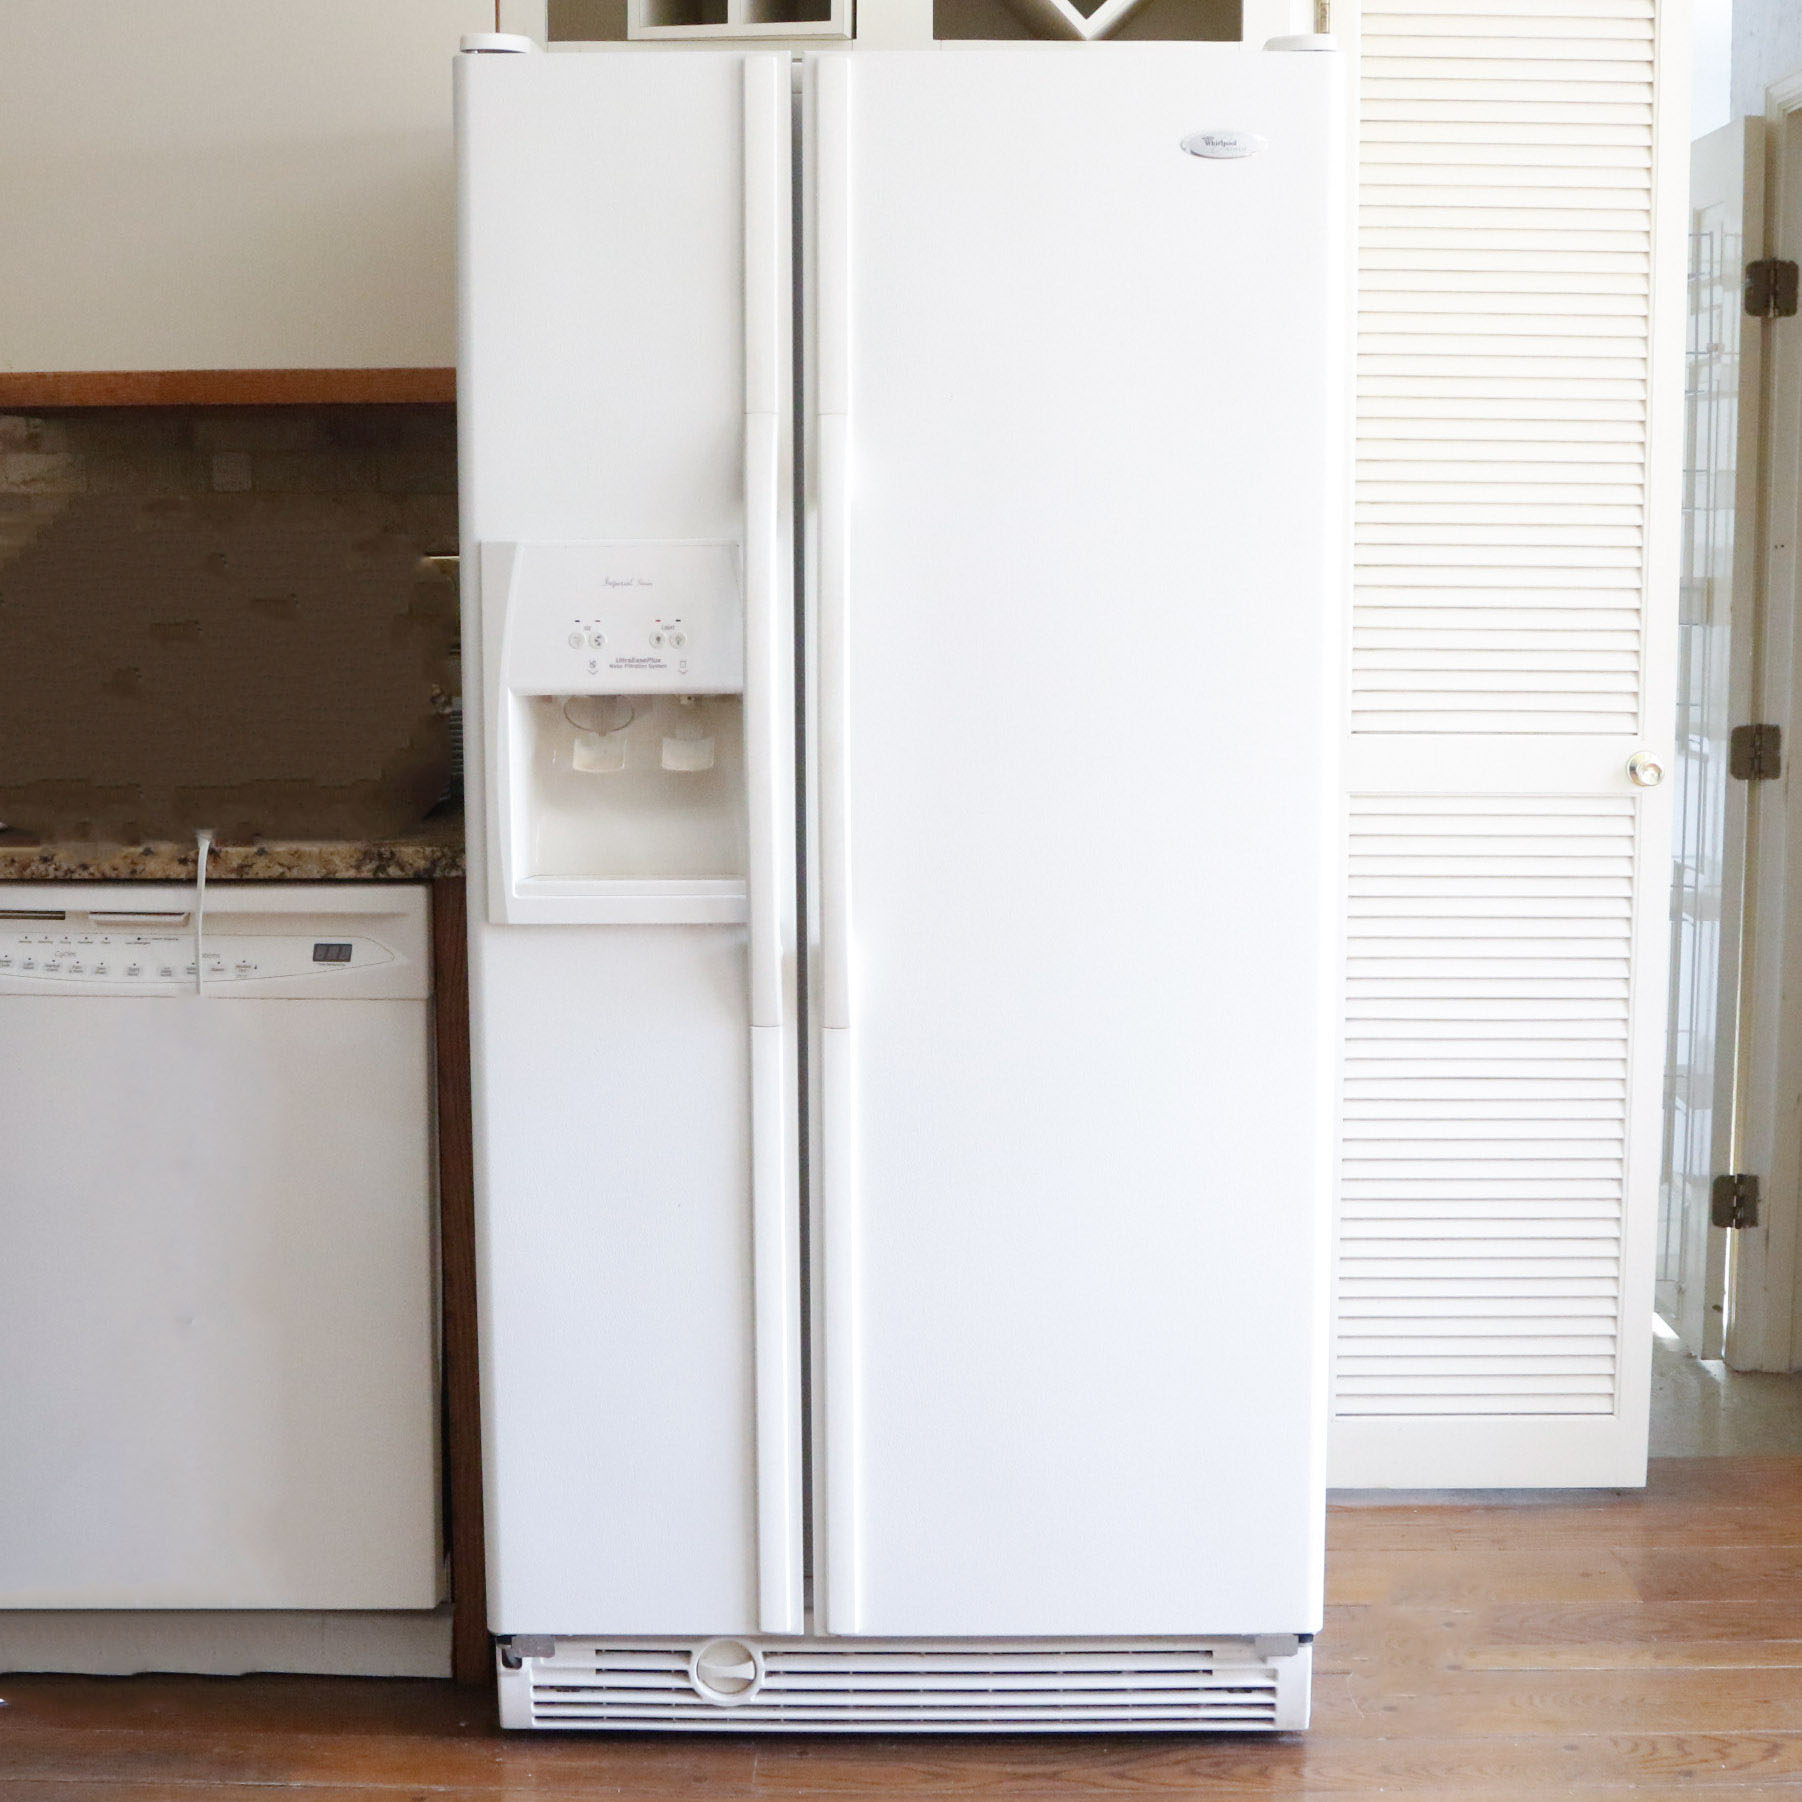 whirlpool gold series refrigerator. whirlpool gold imperial series side-by-side refrigerator